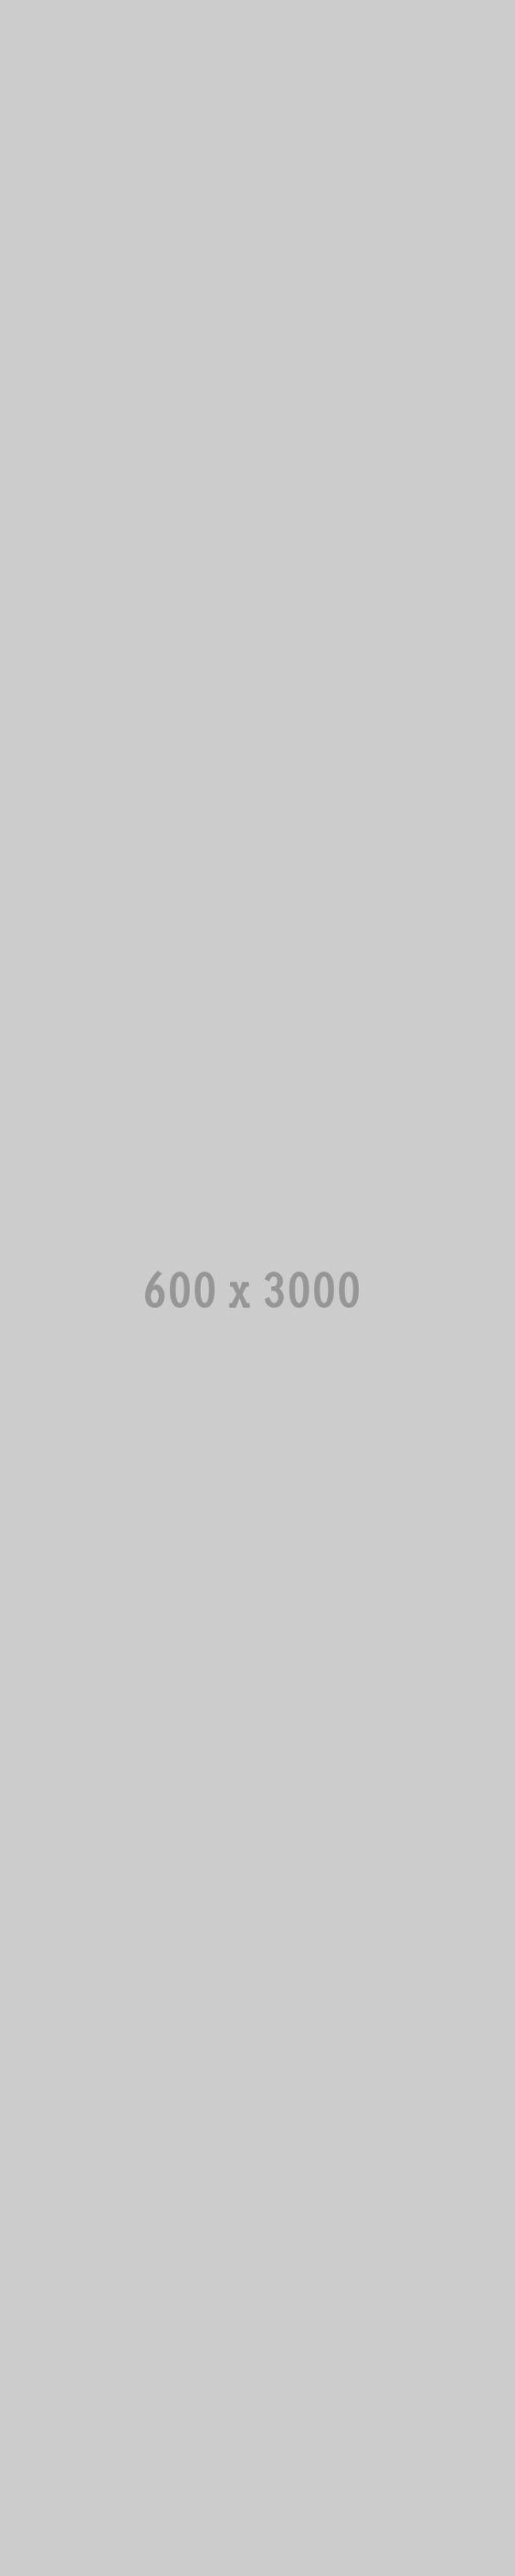 600x3000 (600×3000)